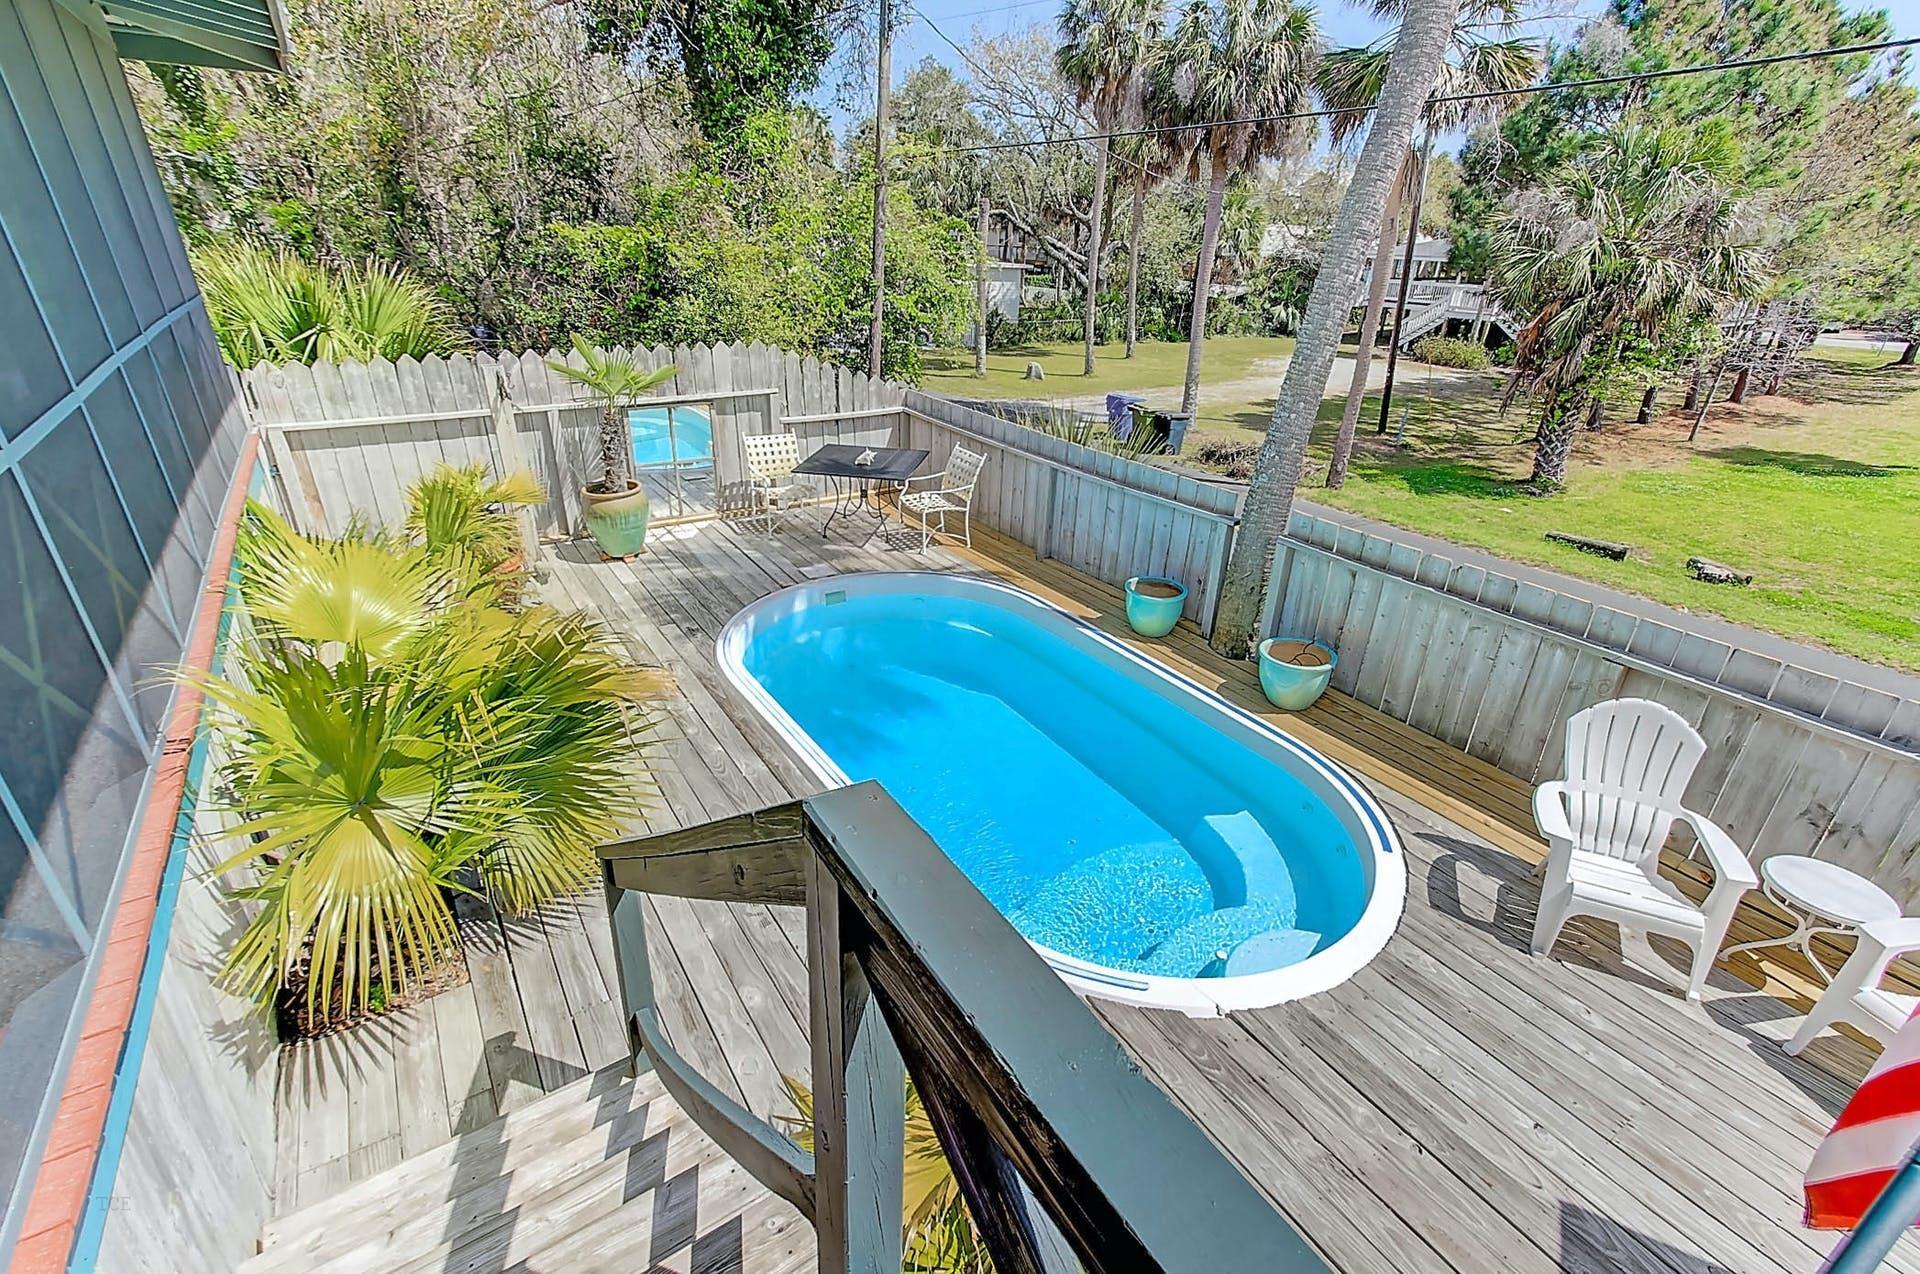 Folly Beach Homes For Sale - 306 Cooper, Folly Beach, SC - 38